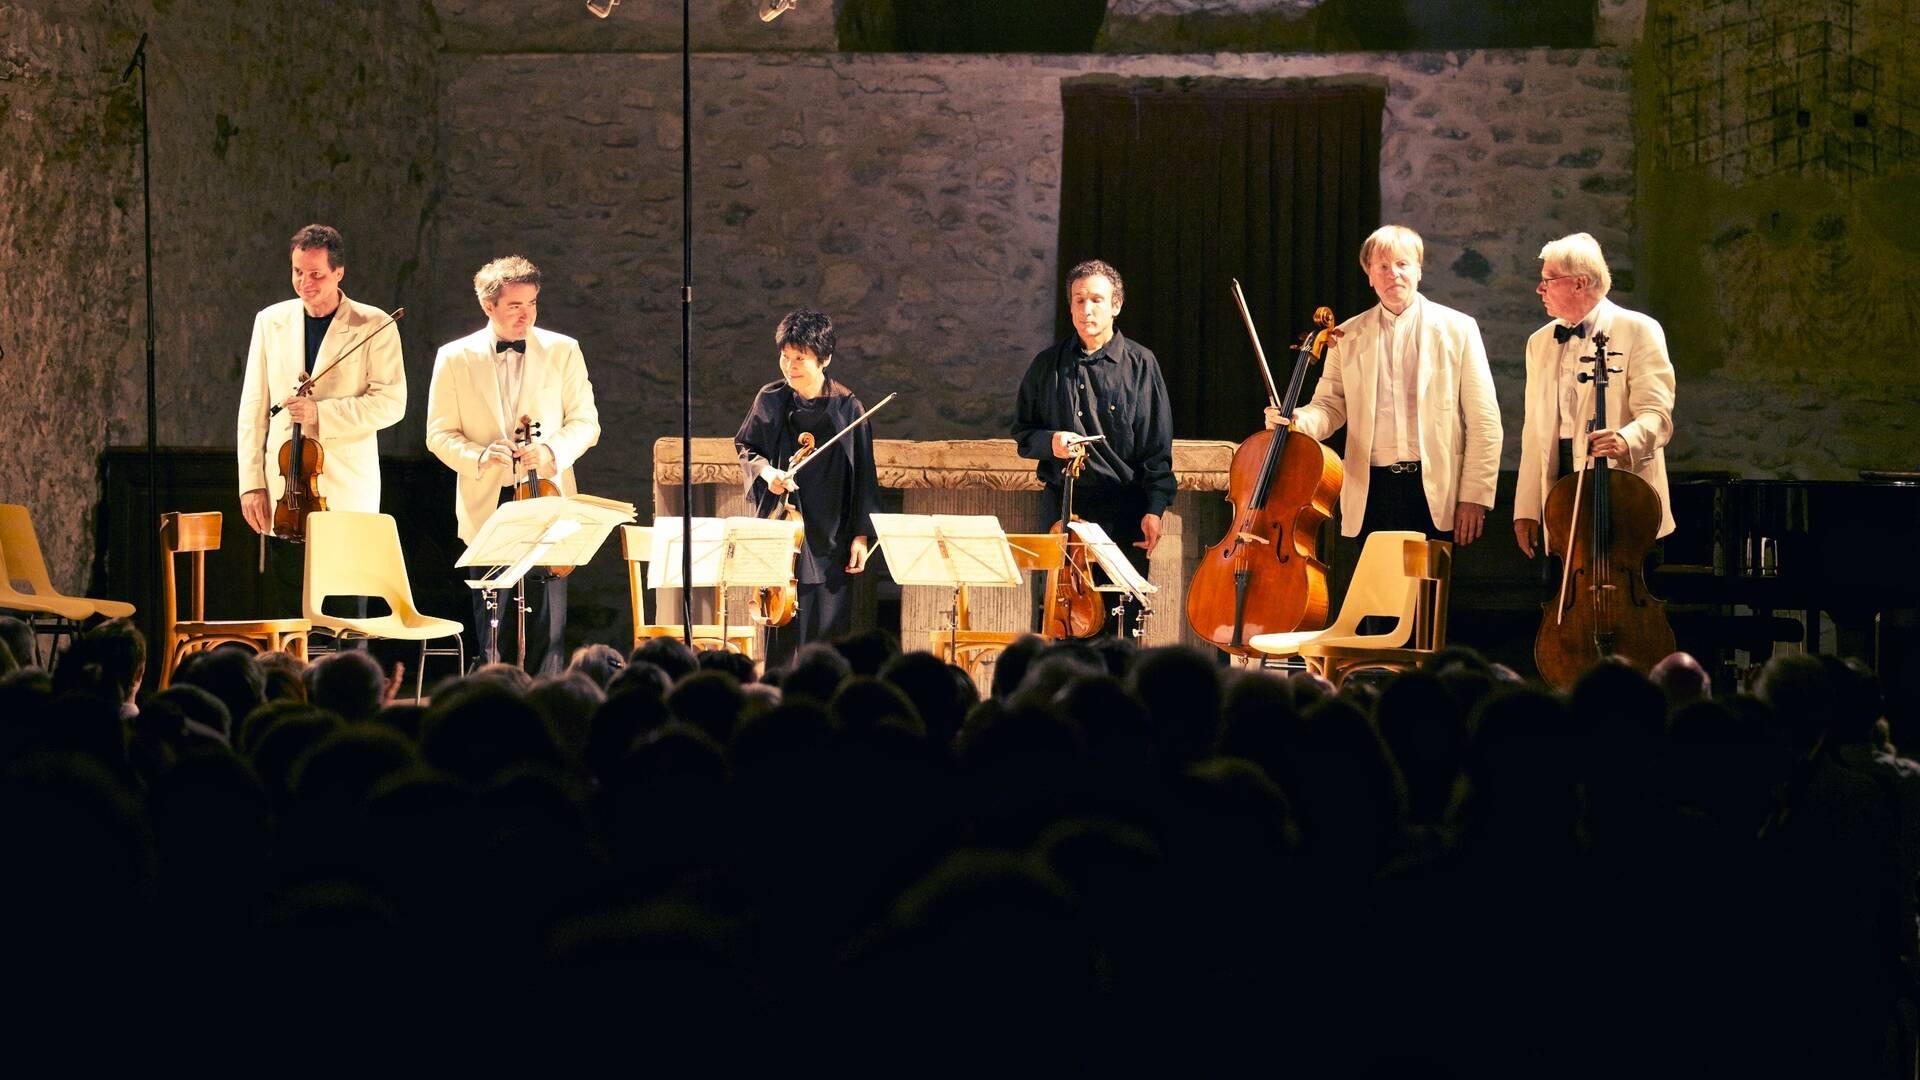 Festival Pablo Casals © Josep MOLINA